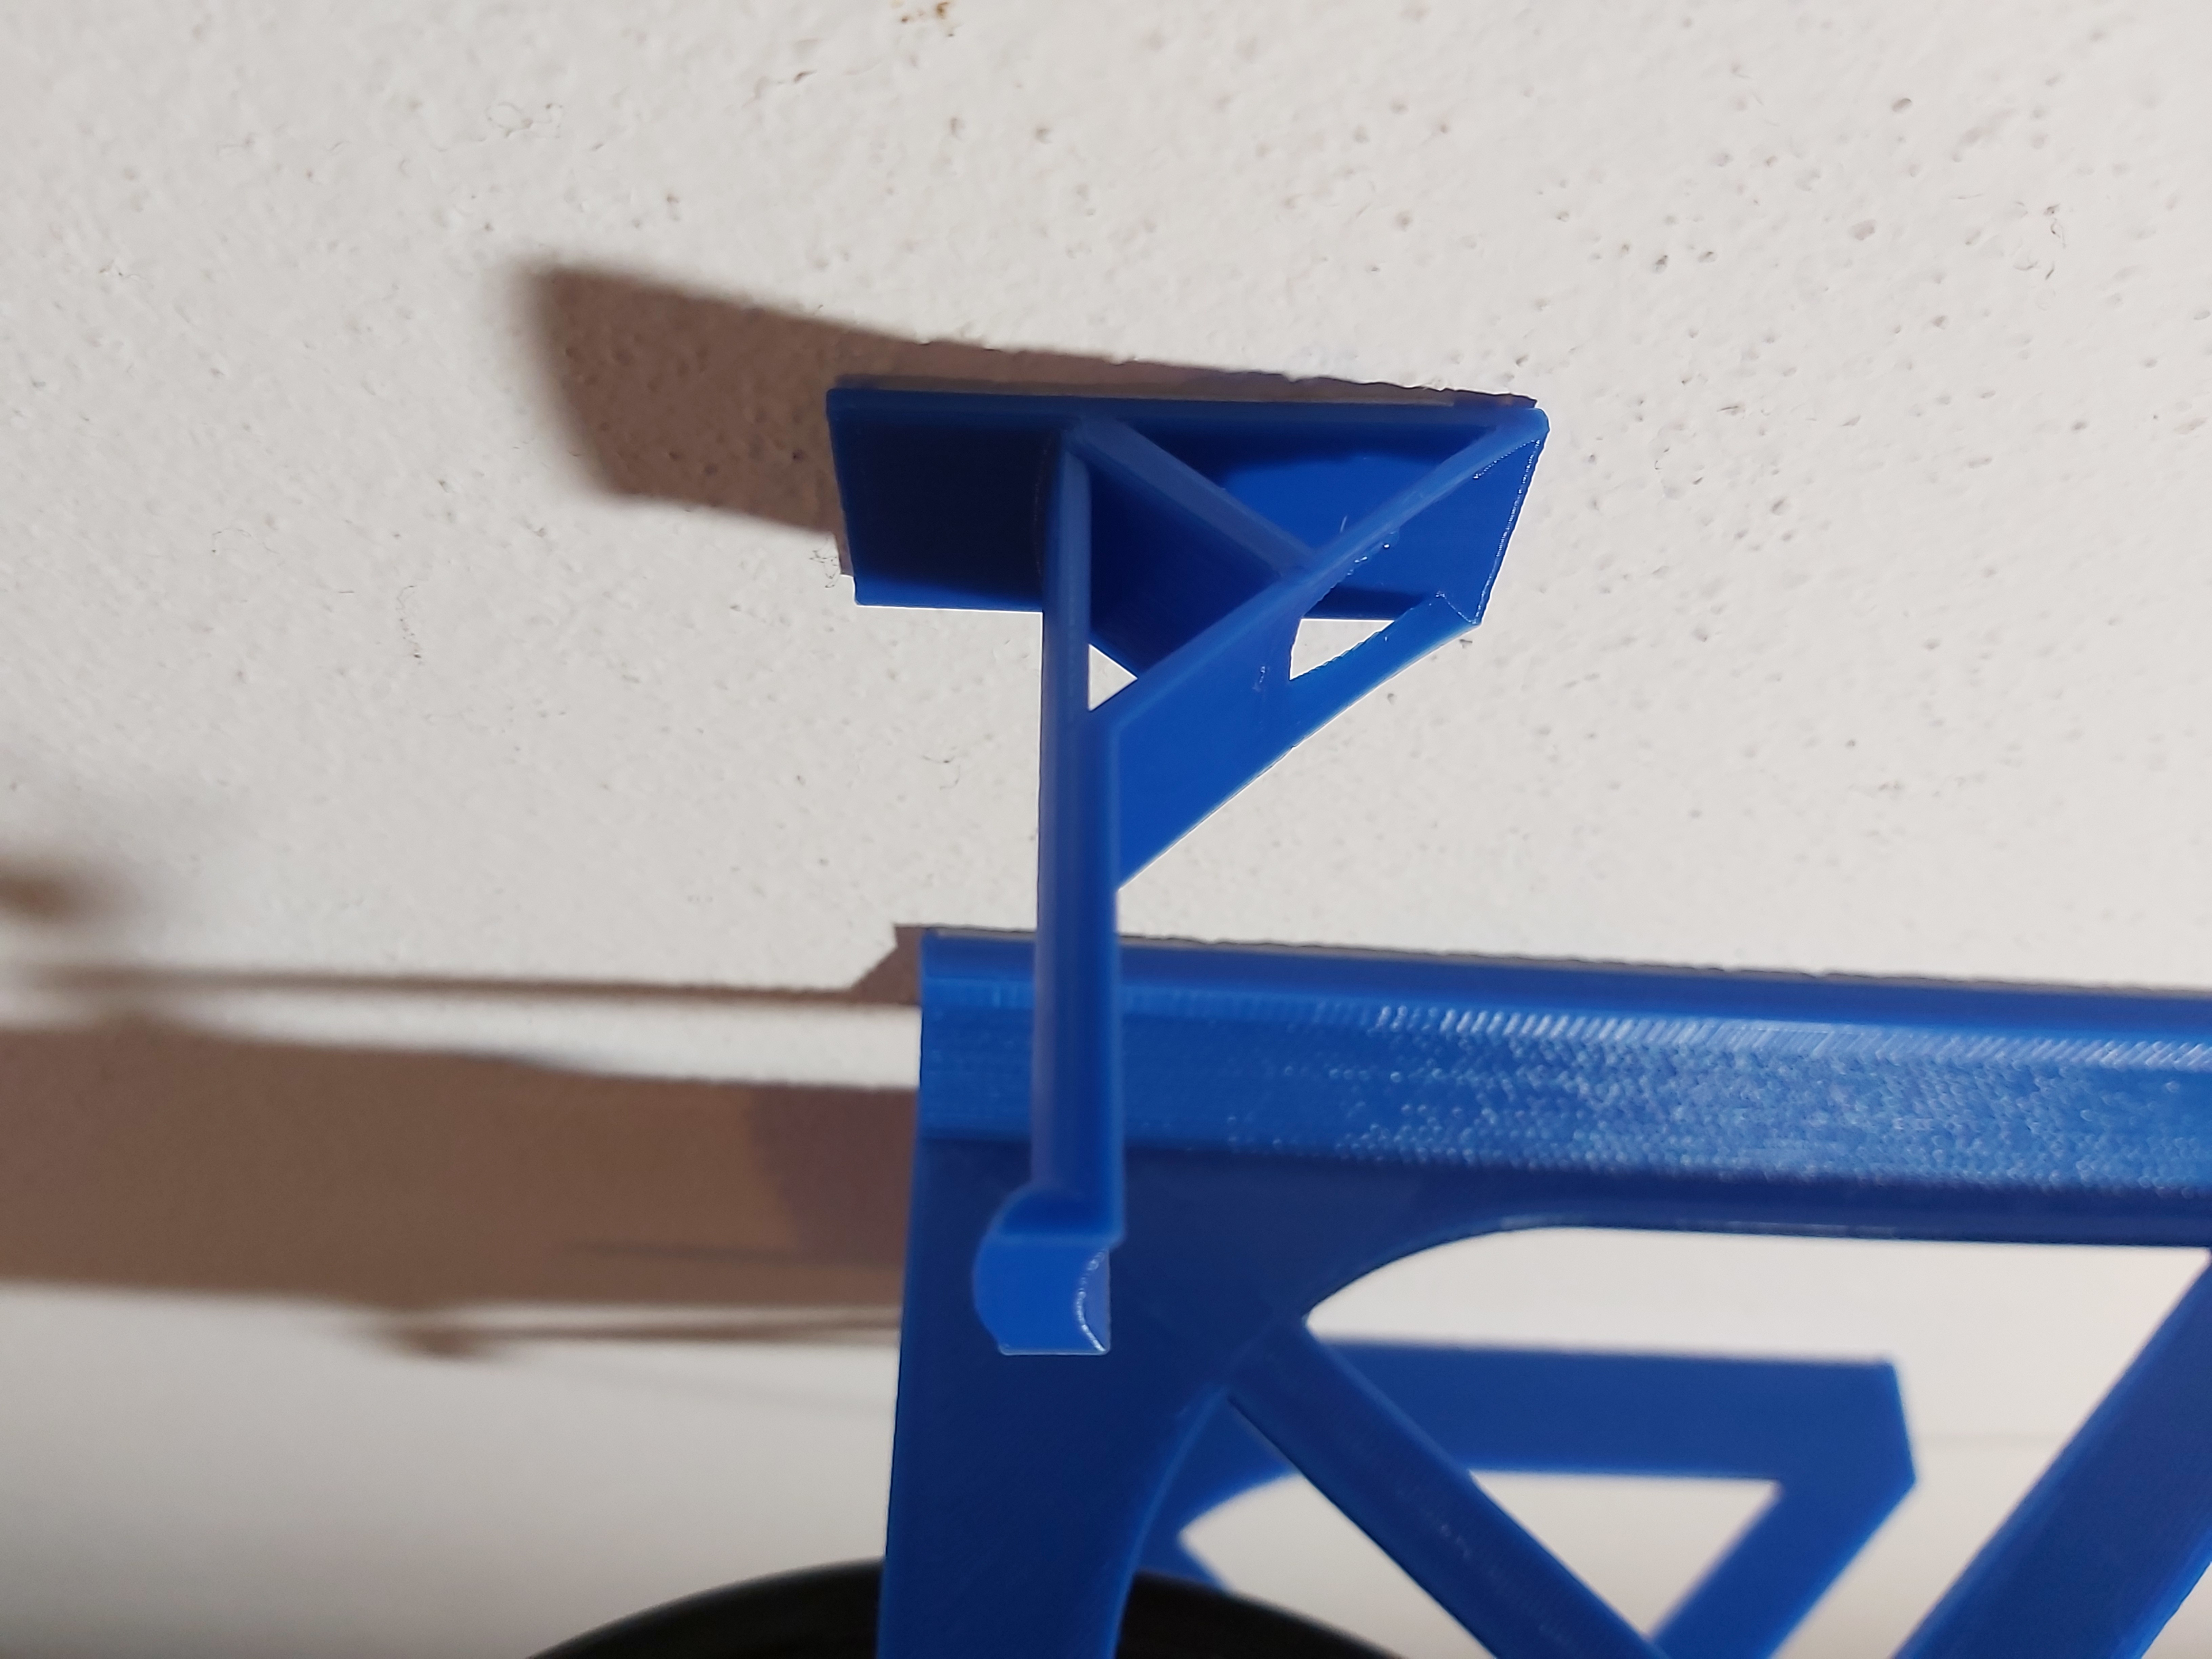 20200617_181357.jpg Download free STL file Tape wall mount • 3D printable template, DB46